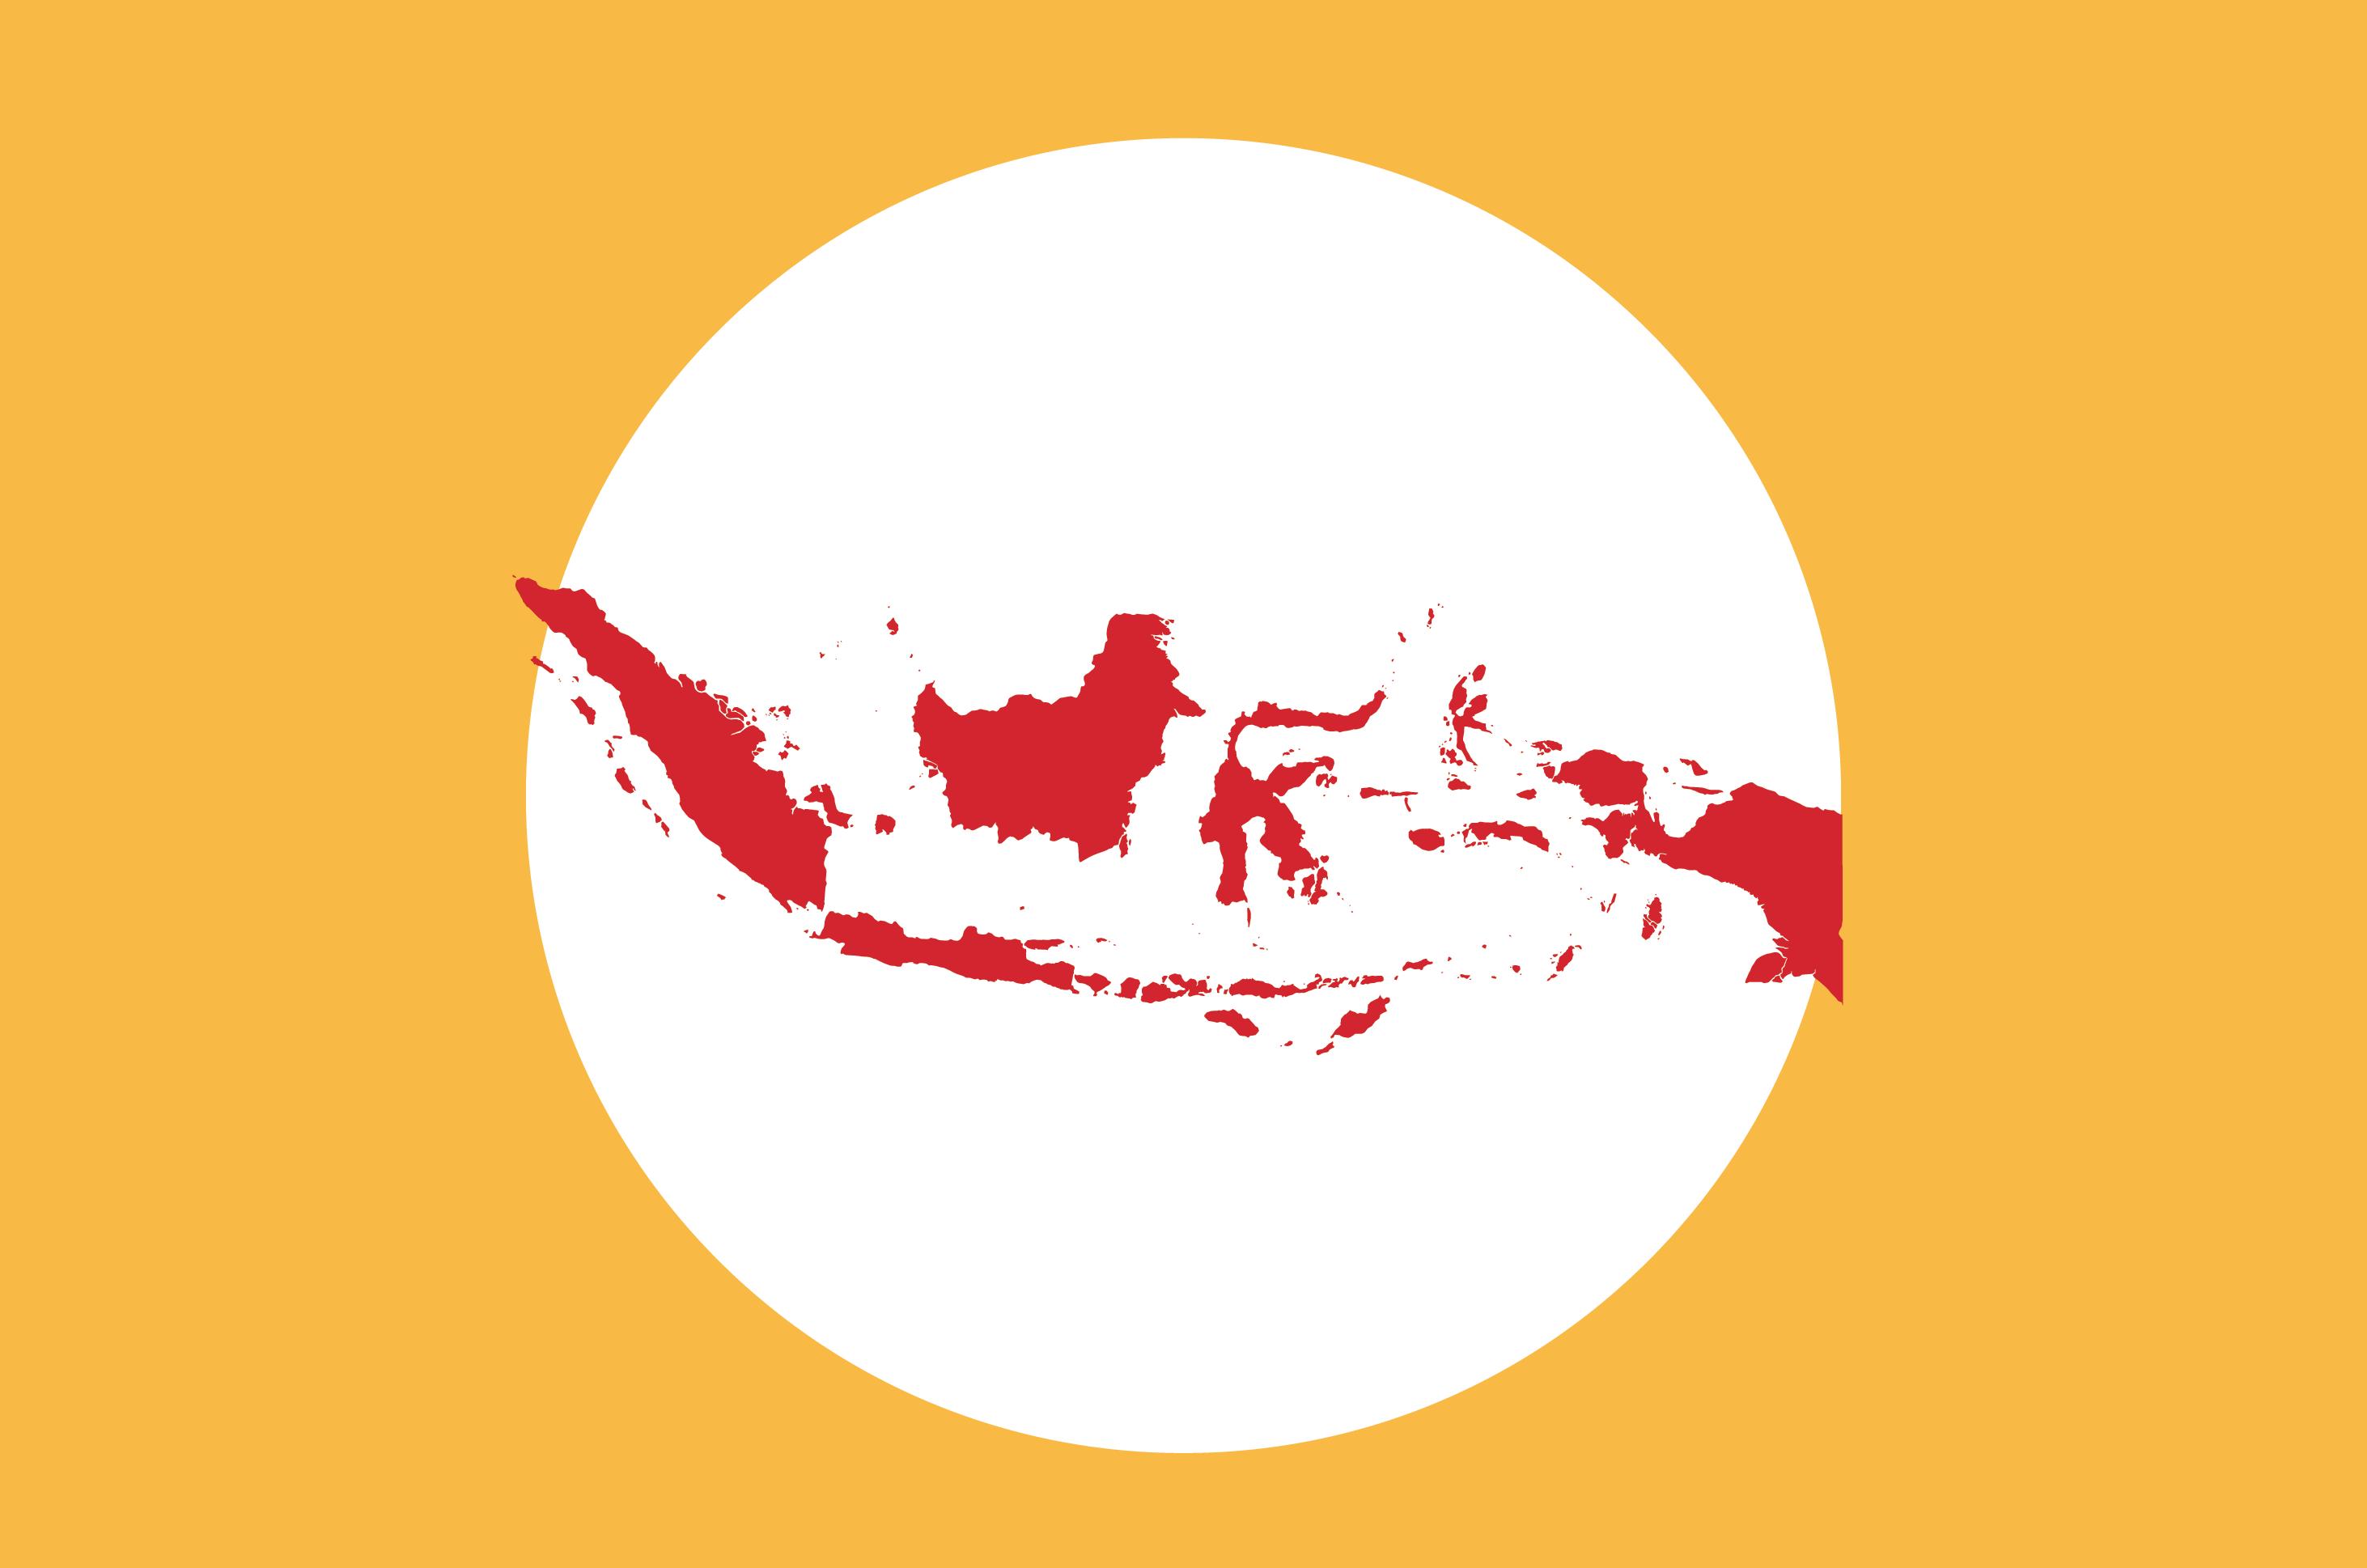 Indonesia Aman dari Ebola, Benarkah?